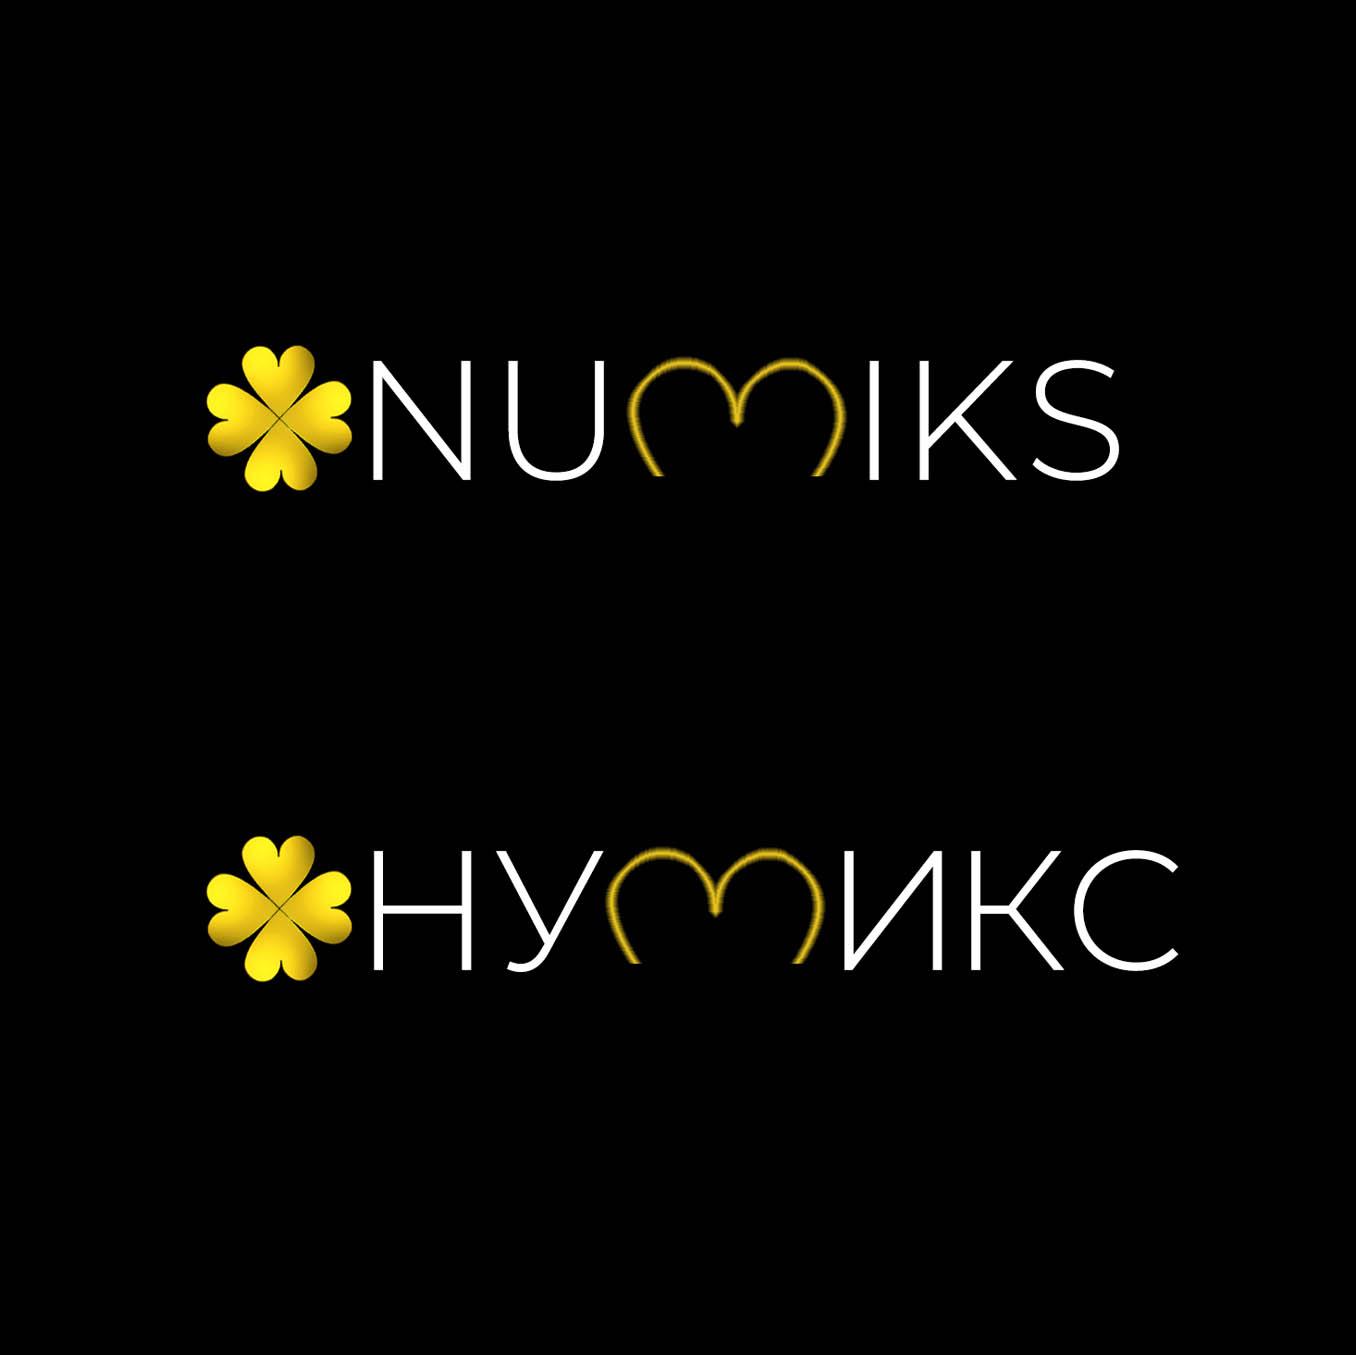 Логотип для интернет-магазина фото f_2845ecbcdb75328e.jpg